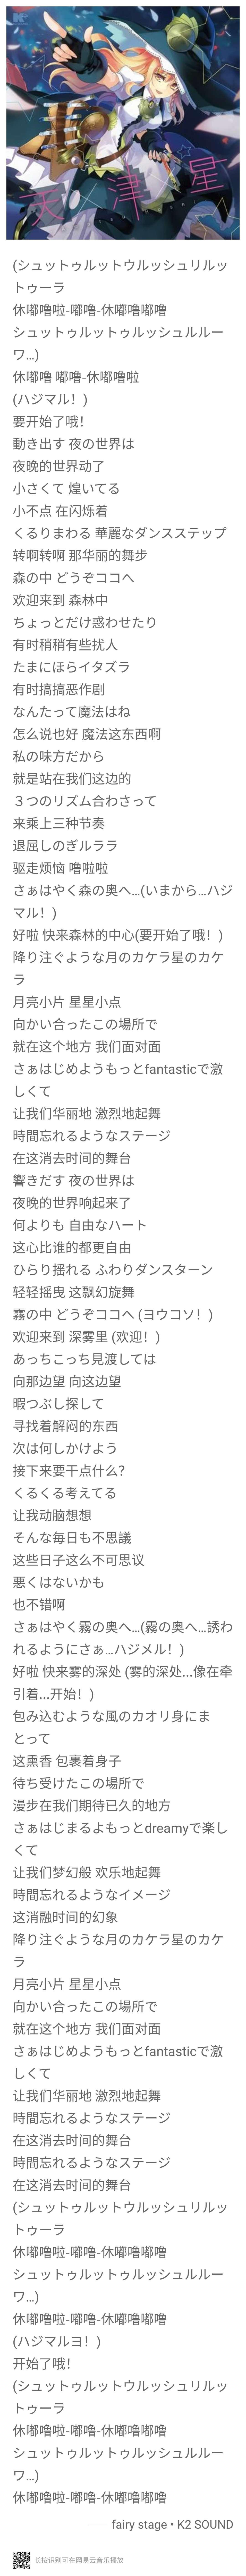 【音乐】fairy stage